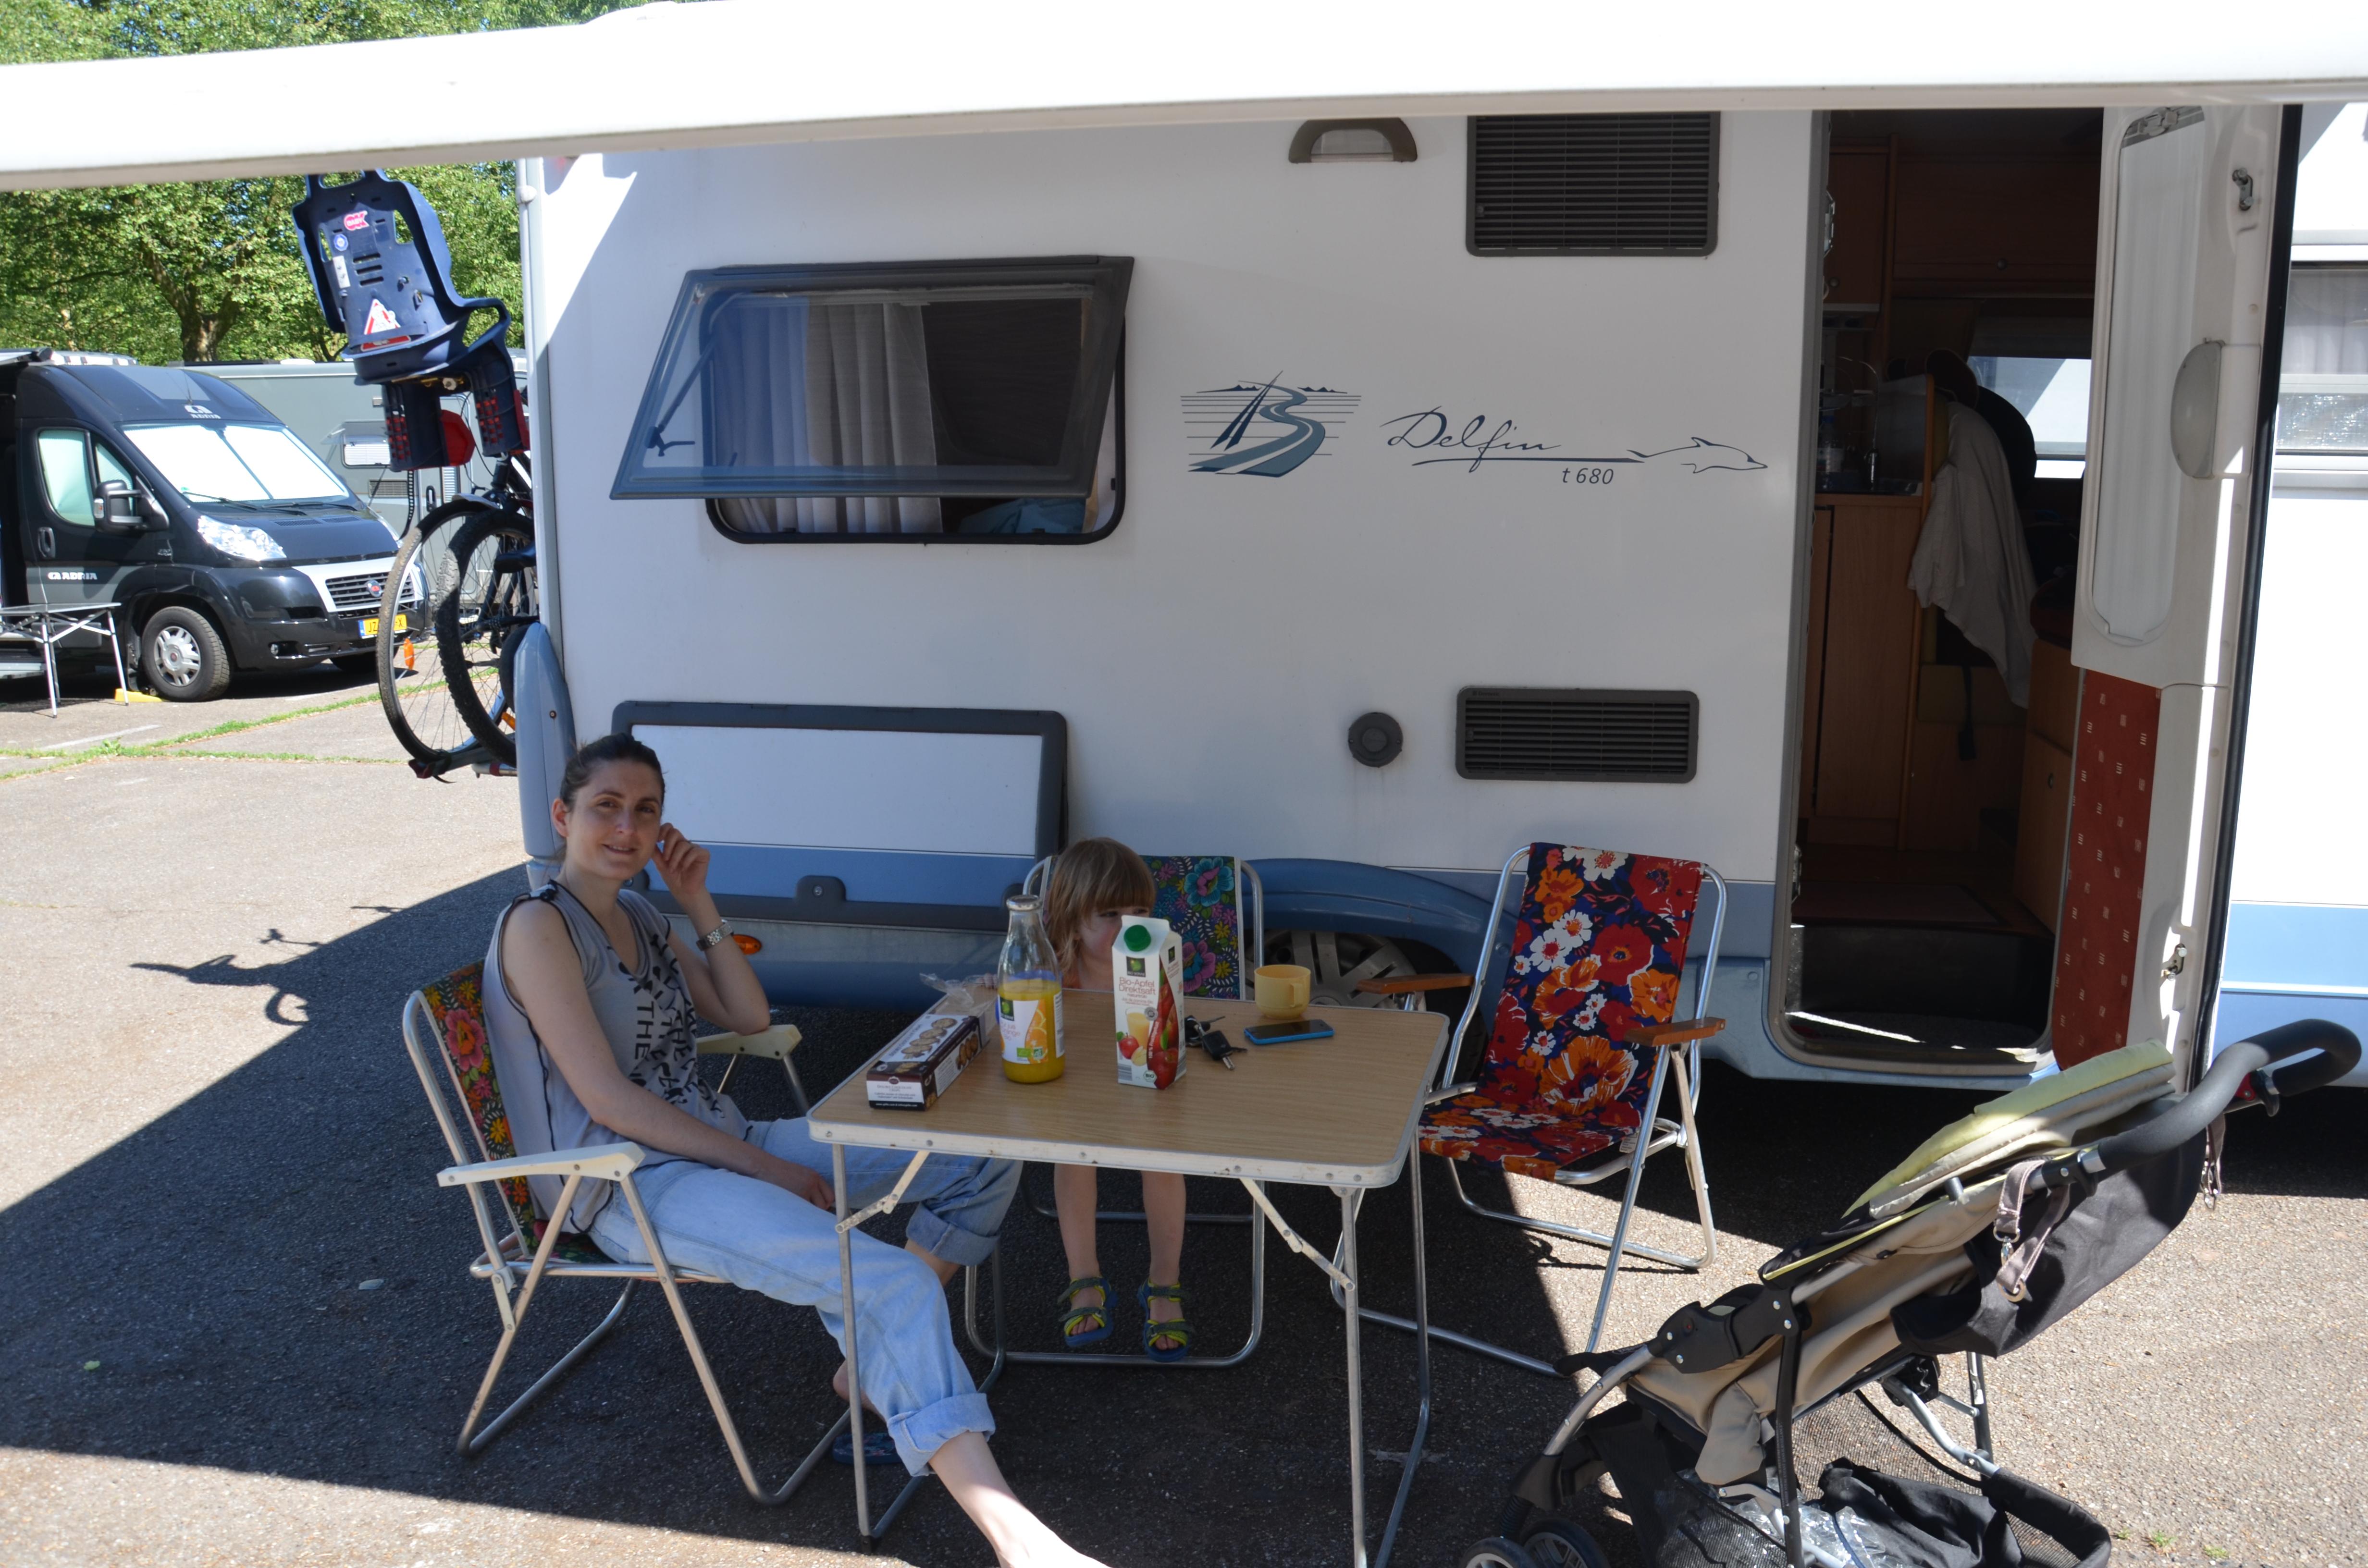 equipement voyageureux camping car